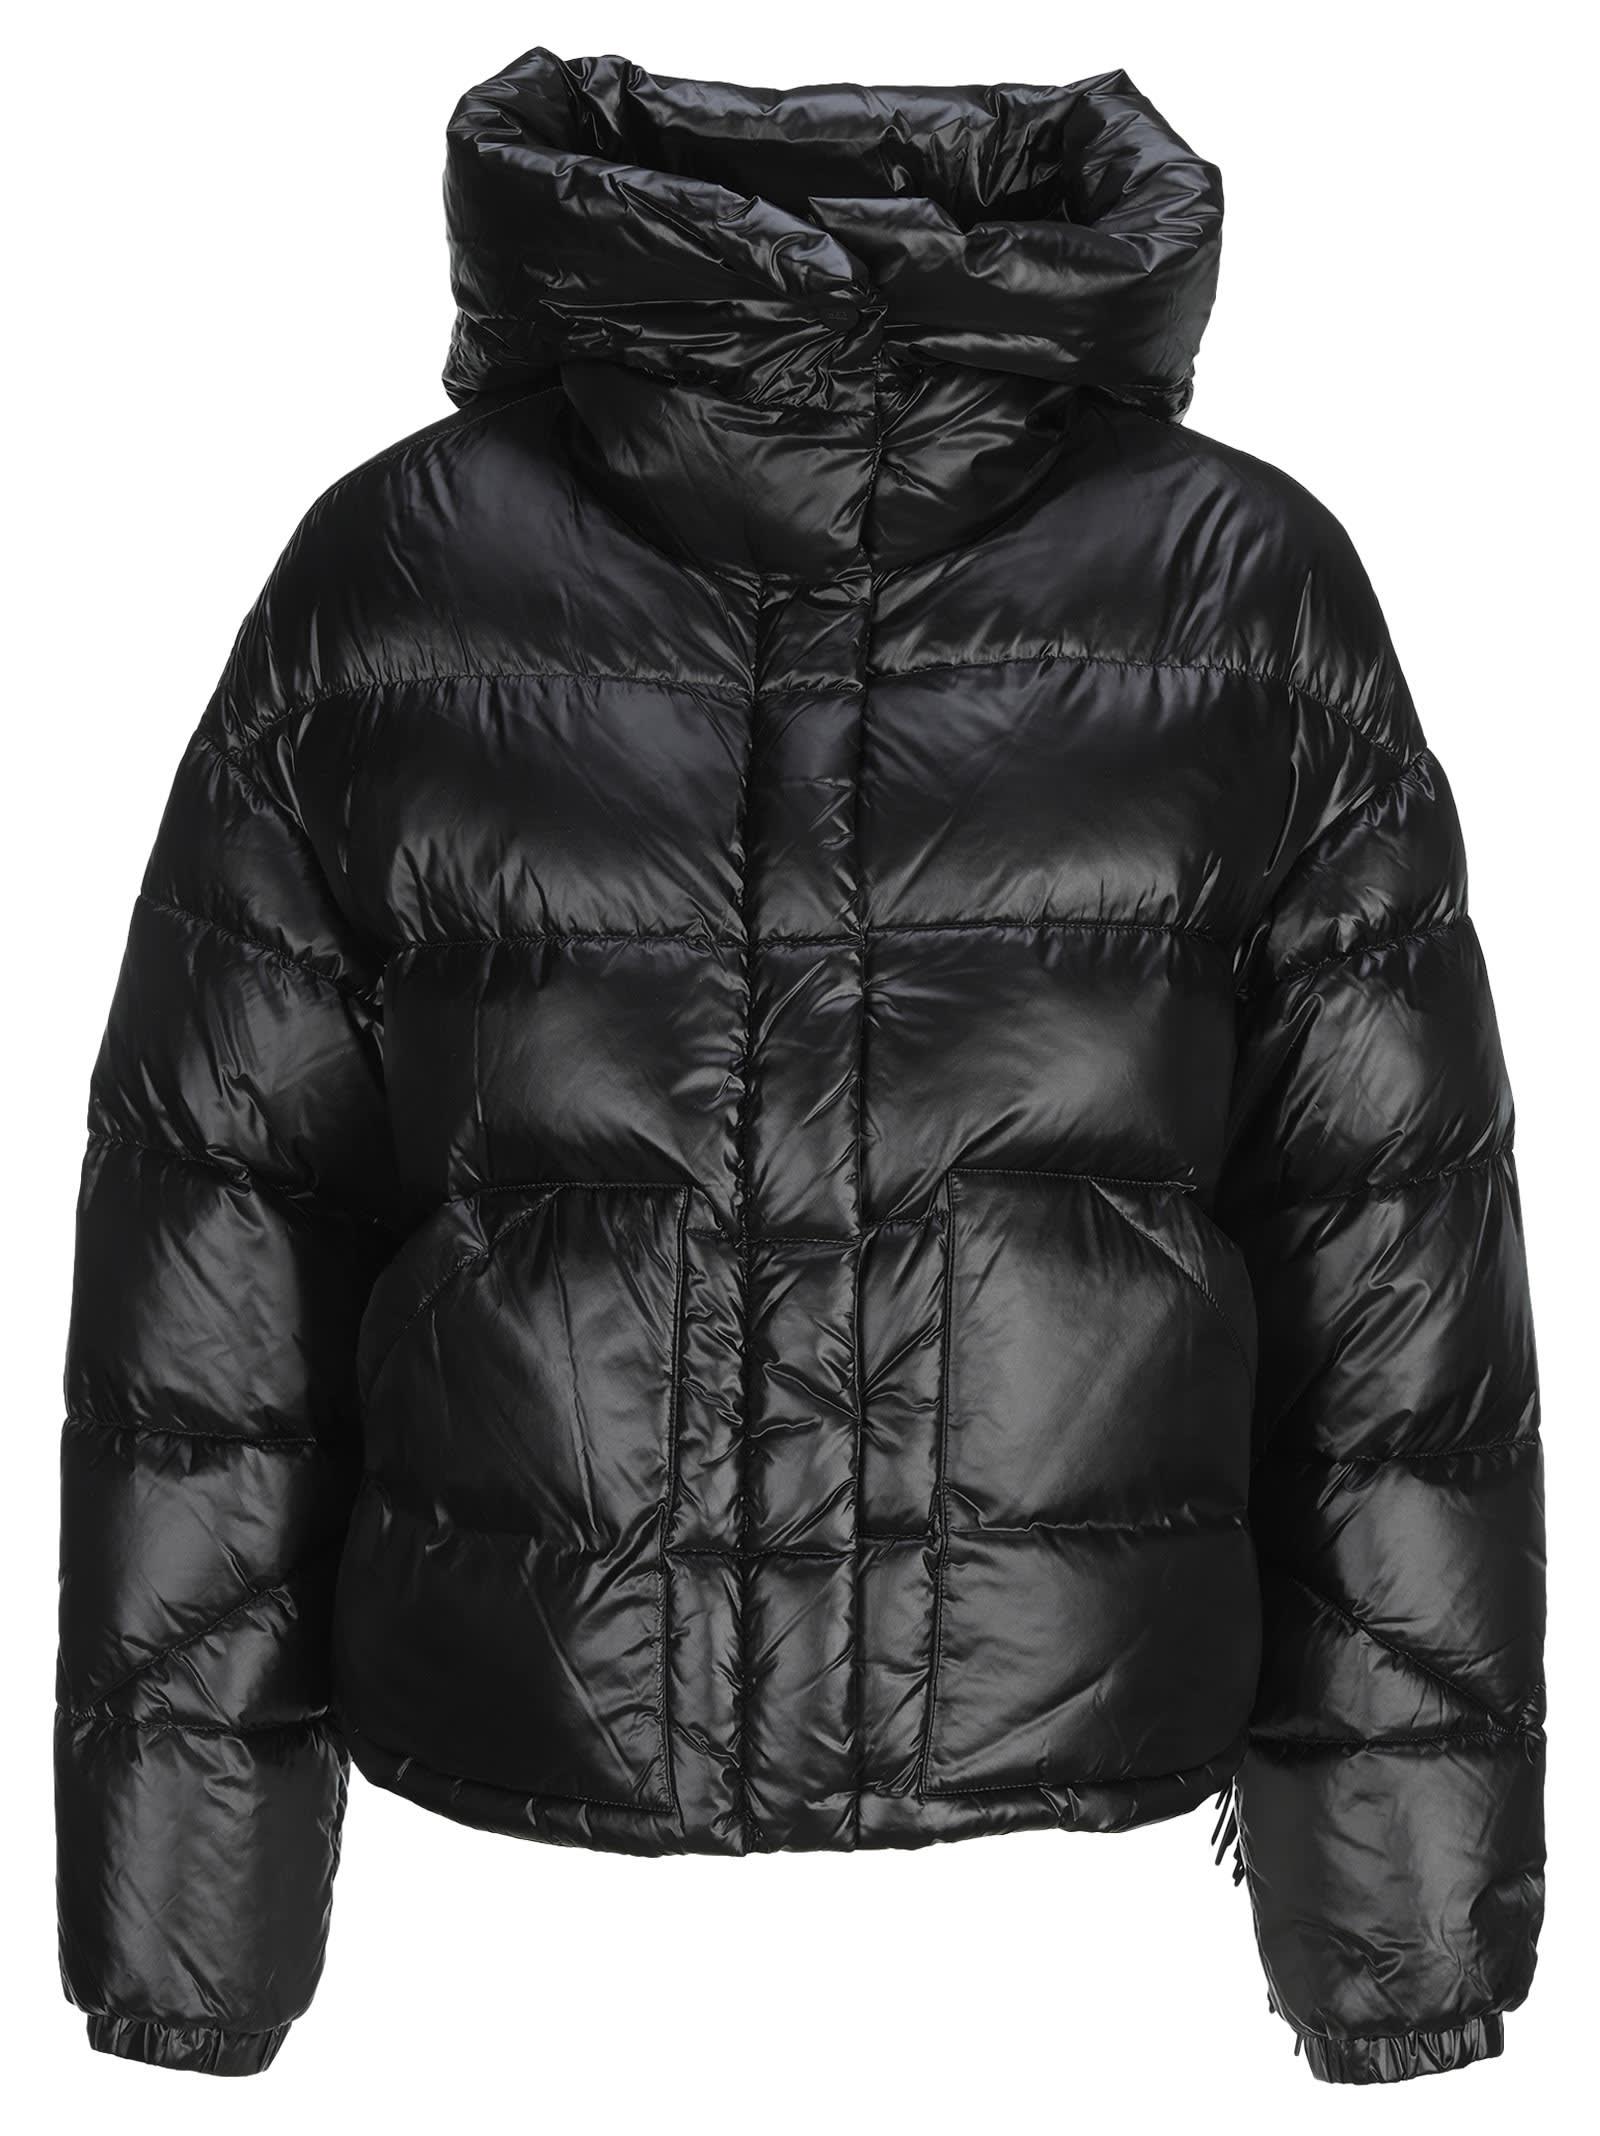 Down Hooded Jacket With Fringe Detailing